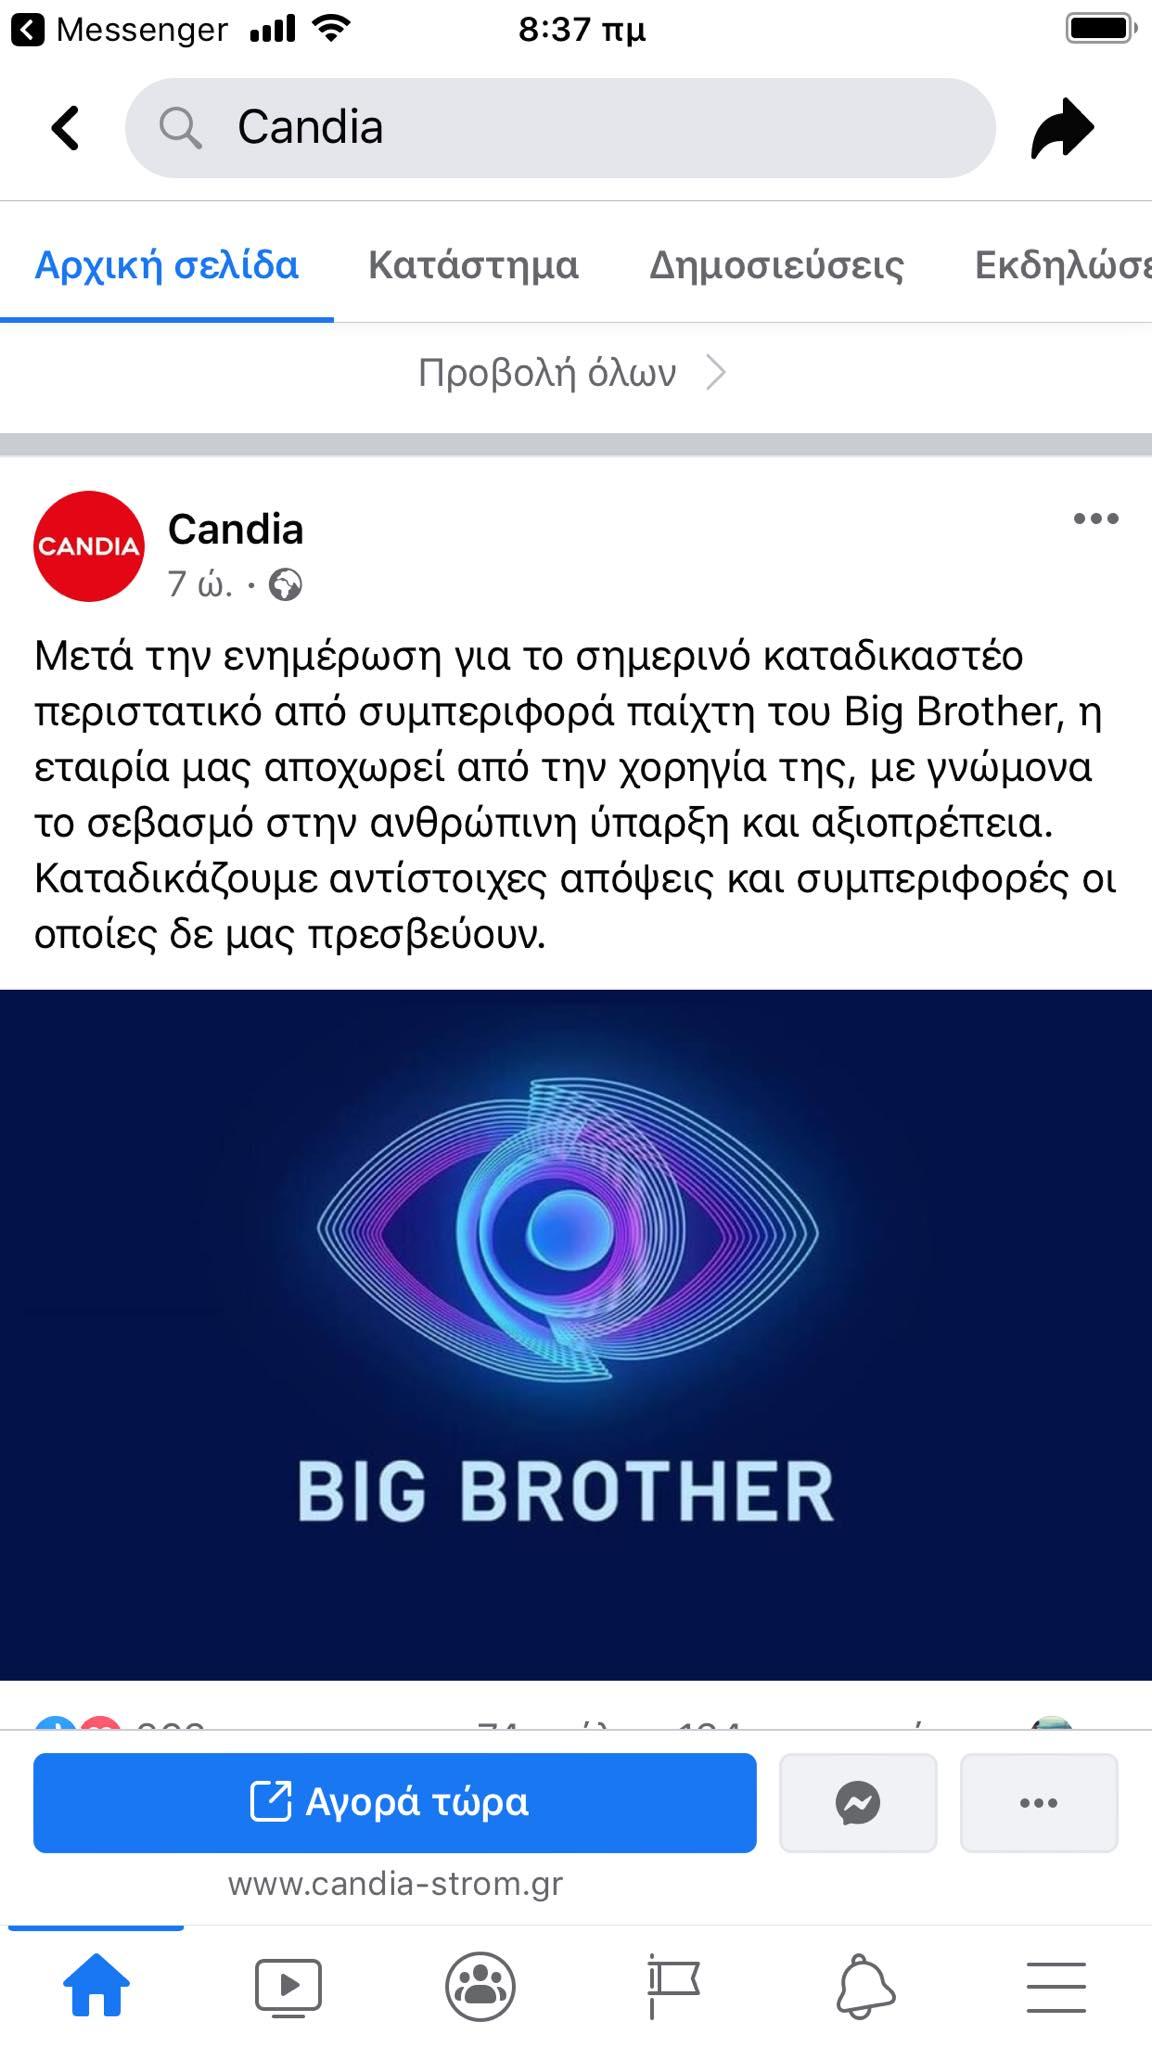 200907091349_xorigos_big_brother2_0709